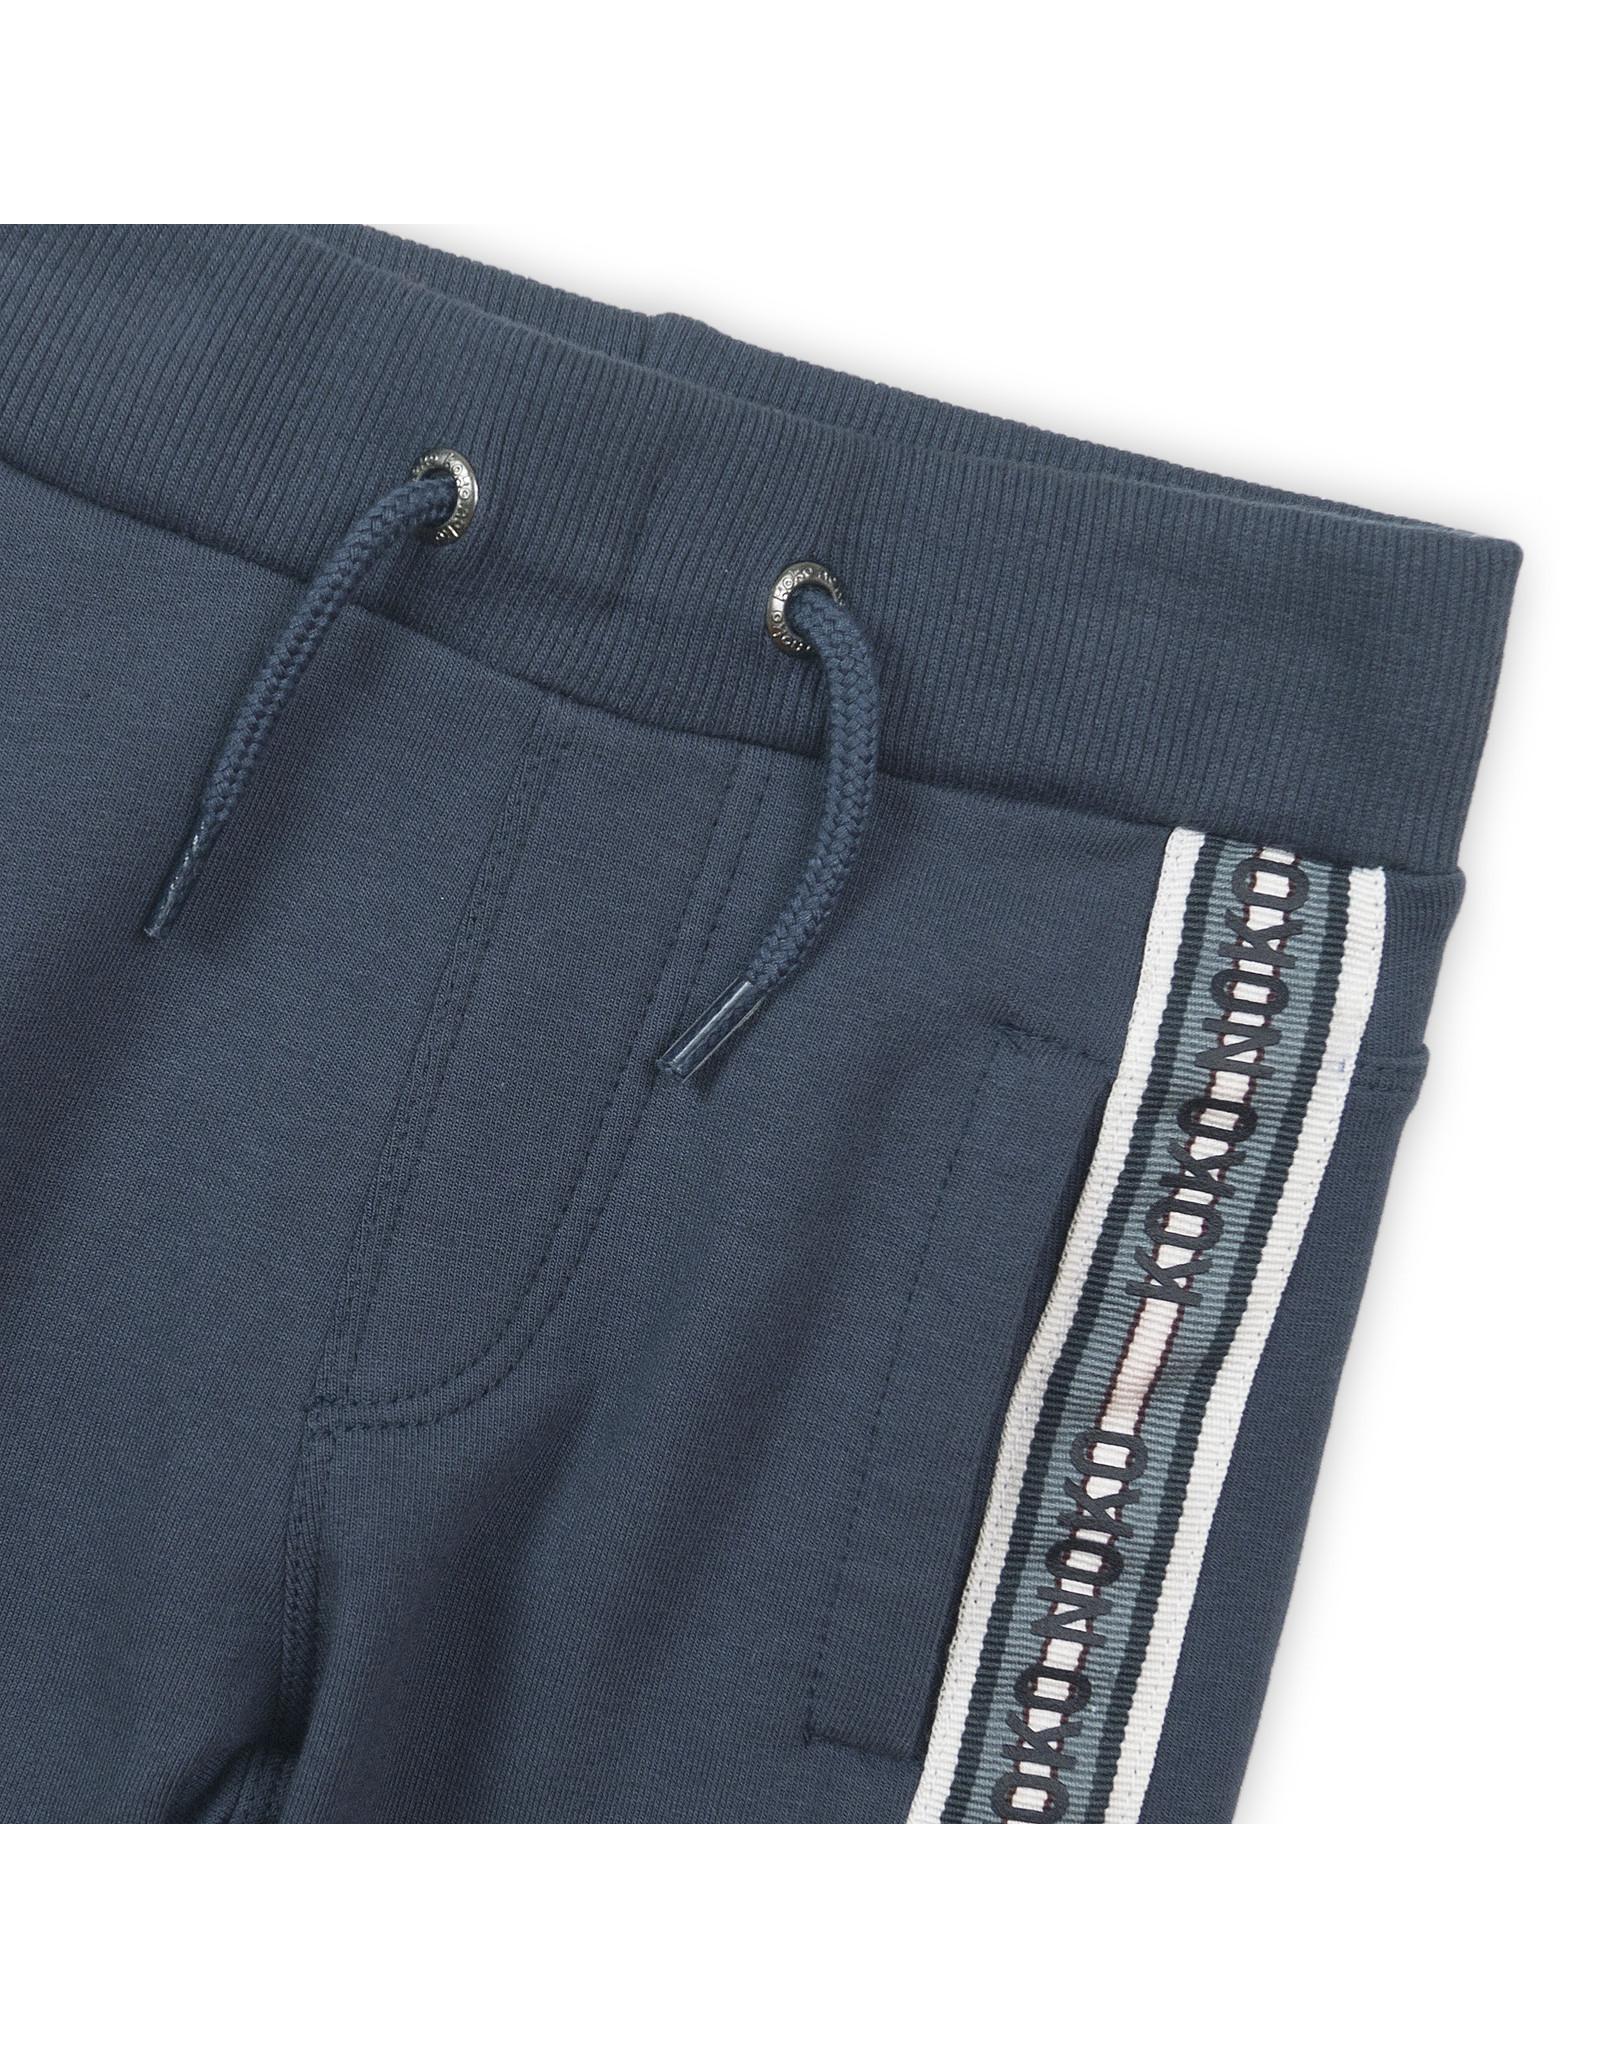 Koko Noko Jogging trousers Navy